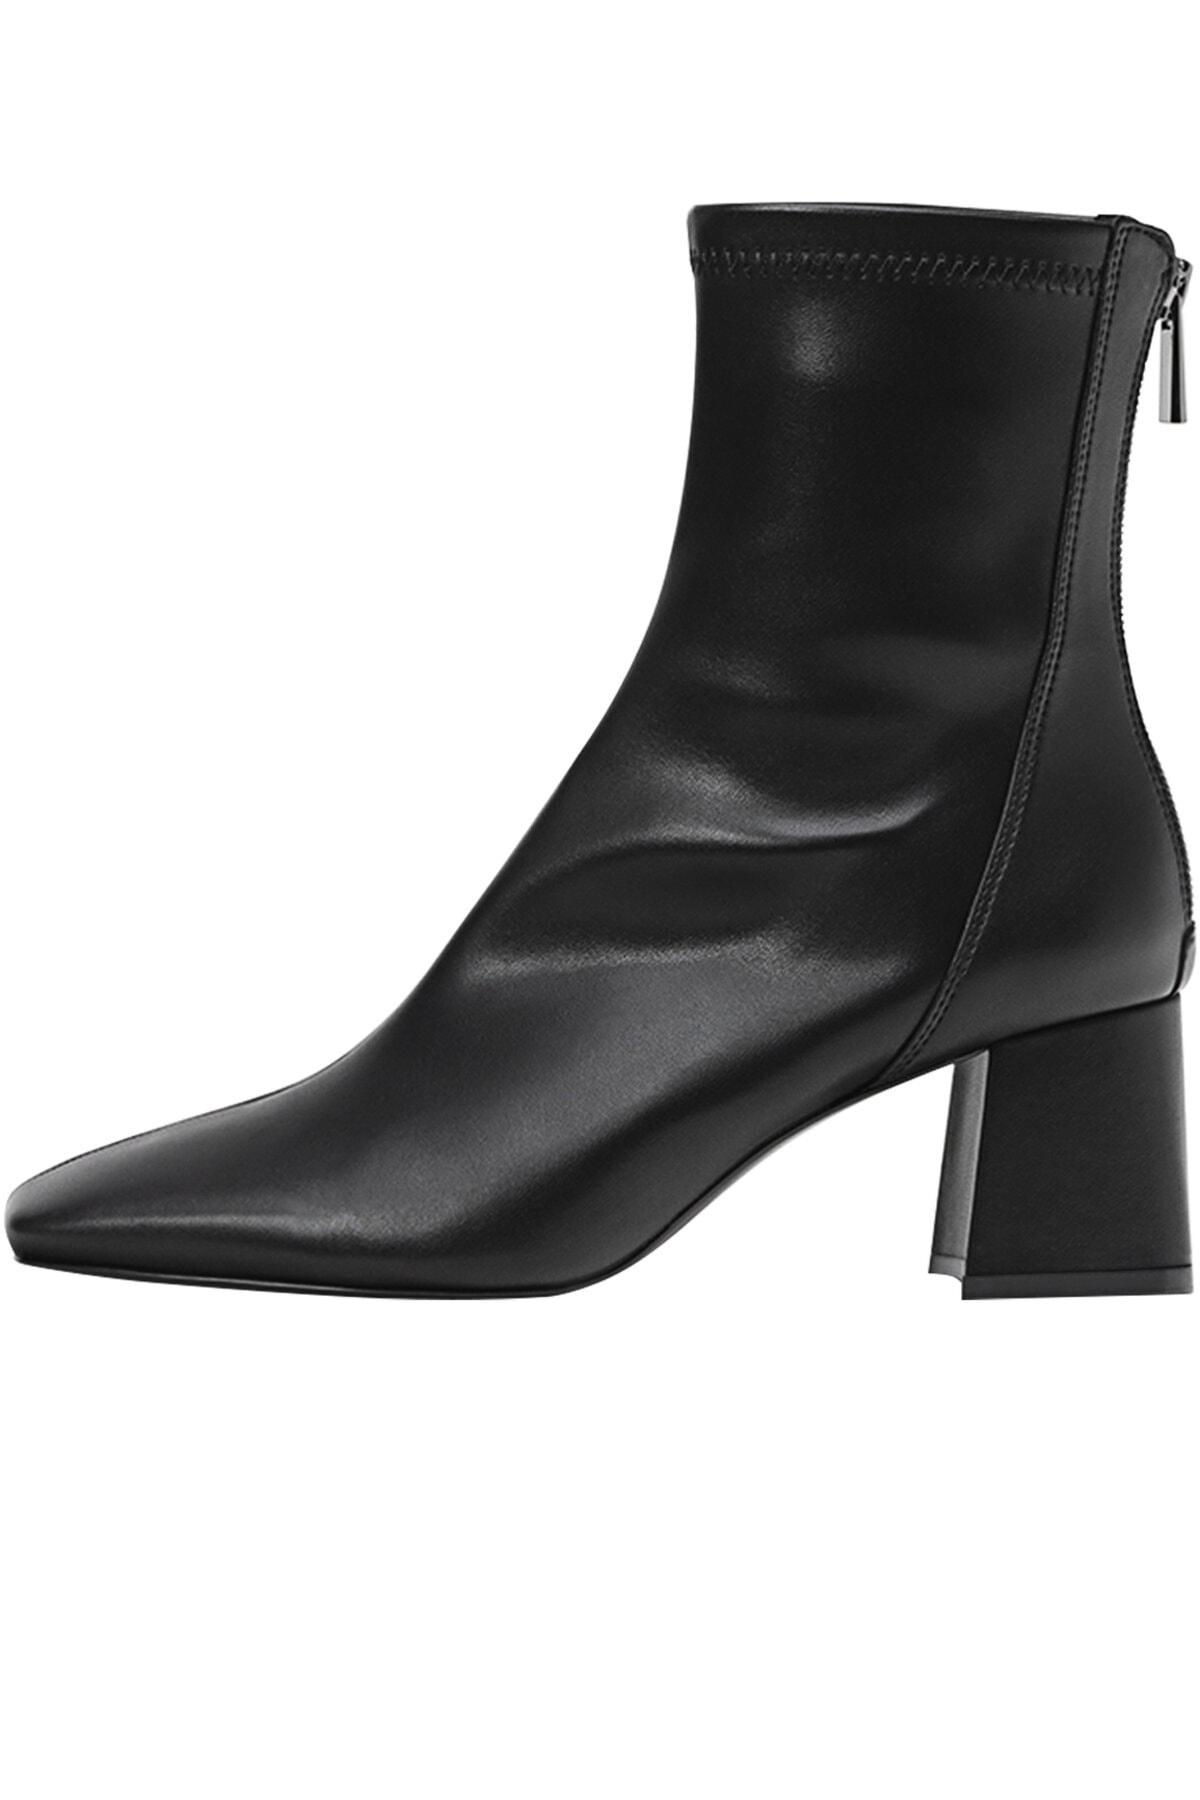 Stradivarius Kadın Siyah Streç Bilekli Orta Boy Topuklu Bot 19902670 1